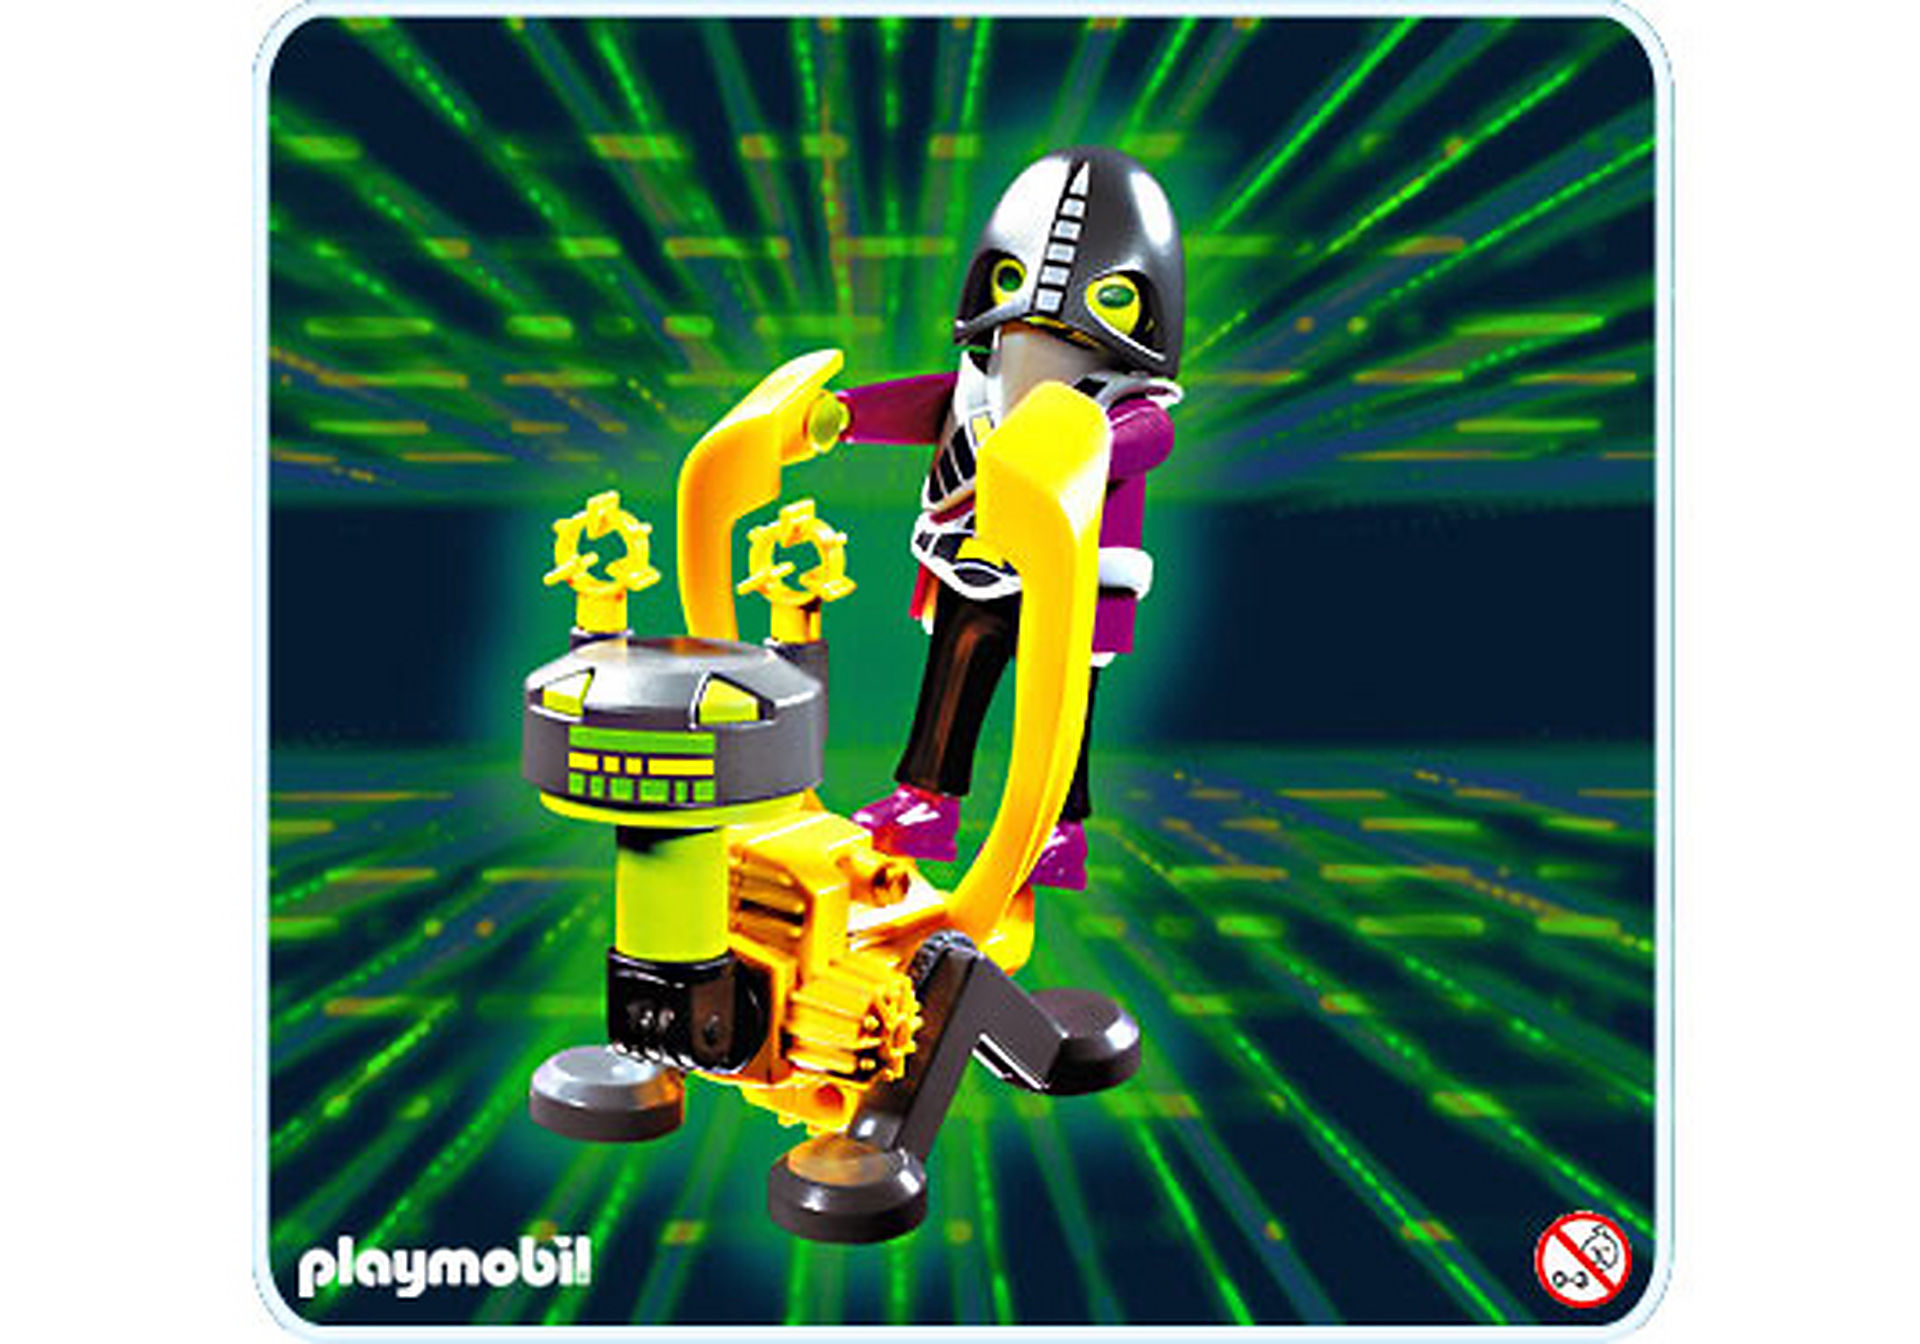 http://media.playmobil.com/i/playmobil/3284-A_product_detail/Alien Hopper